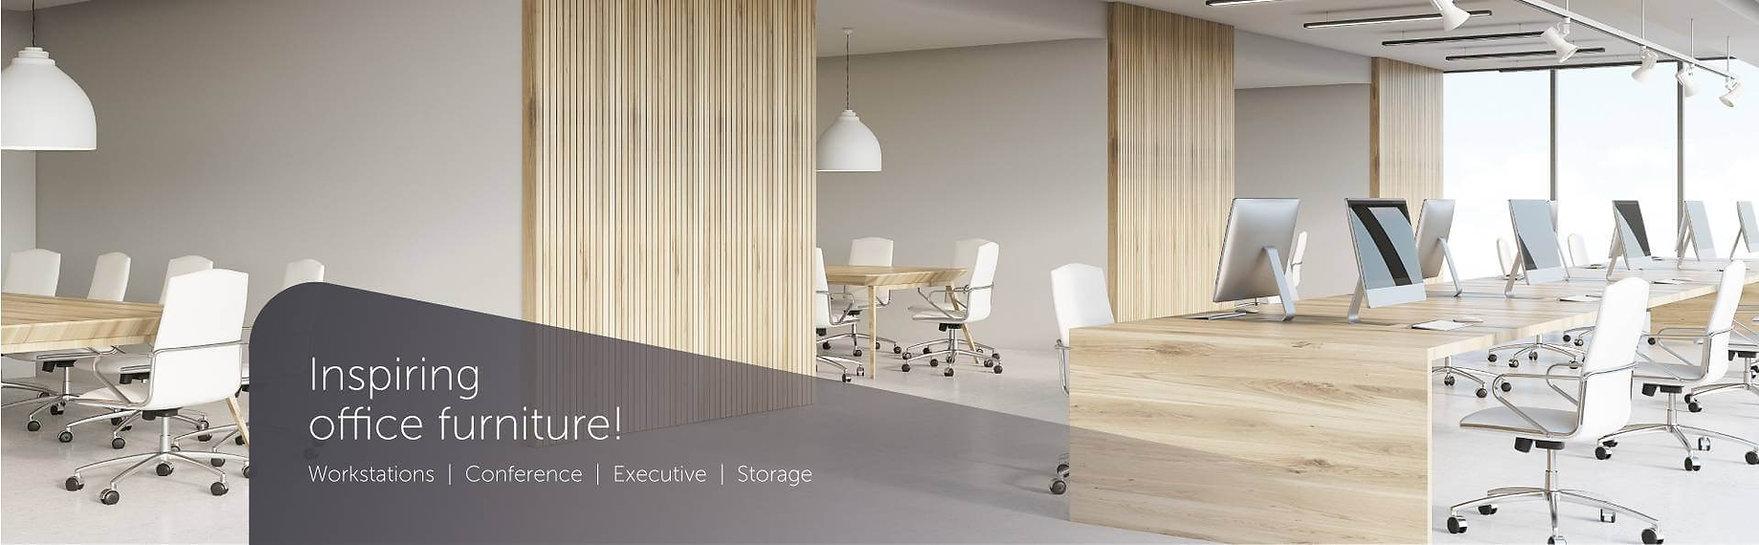 Inspiring-office-furniture-banner.jpg